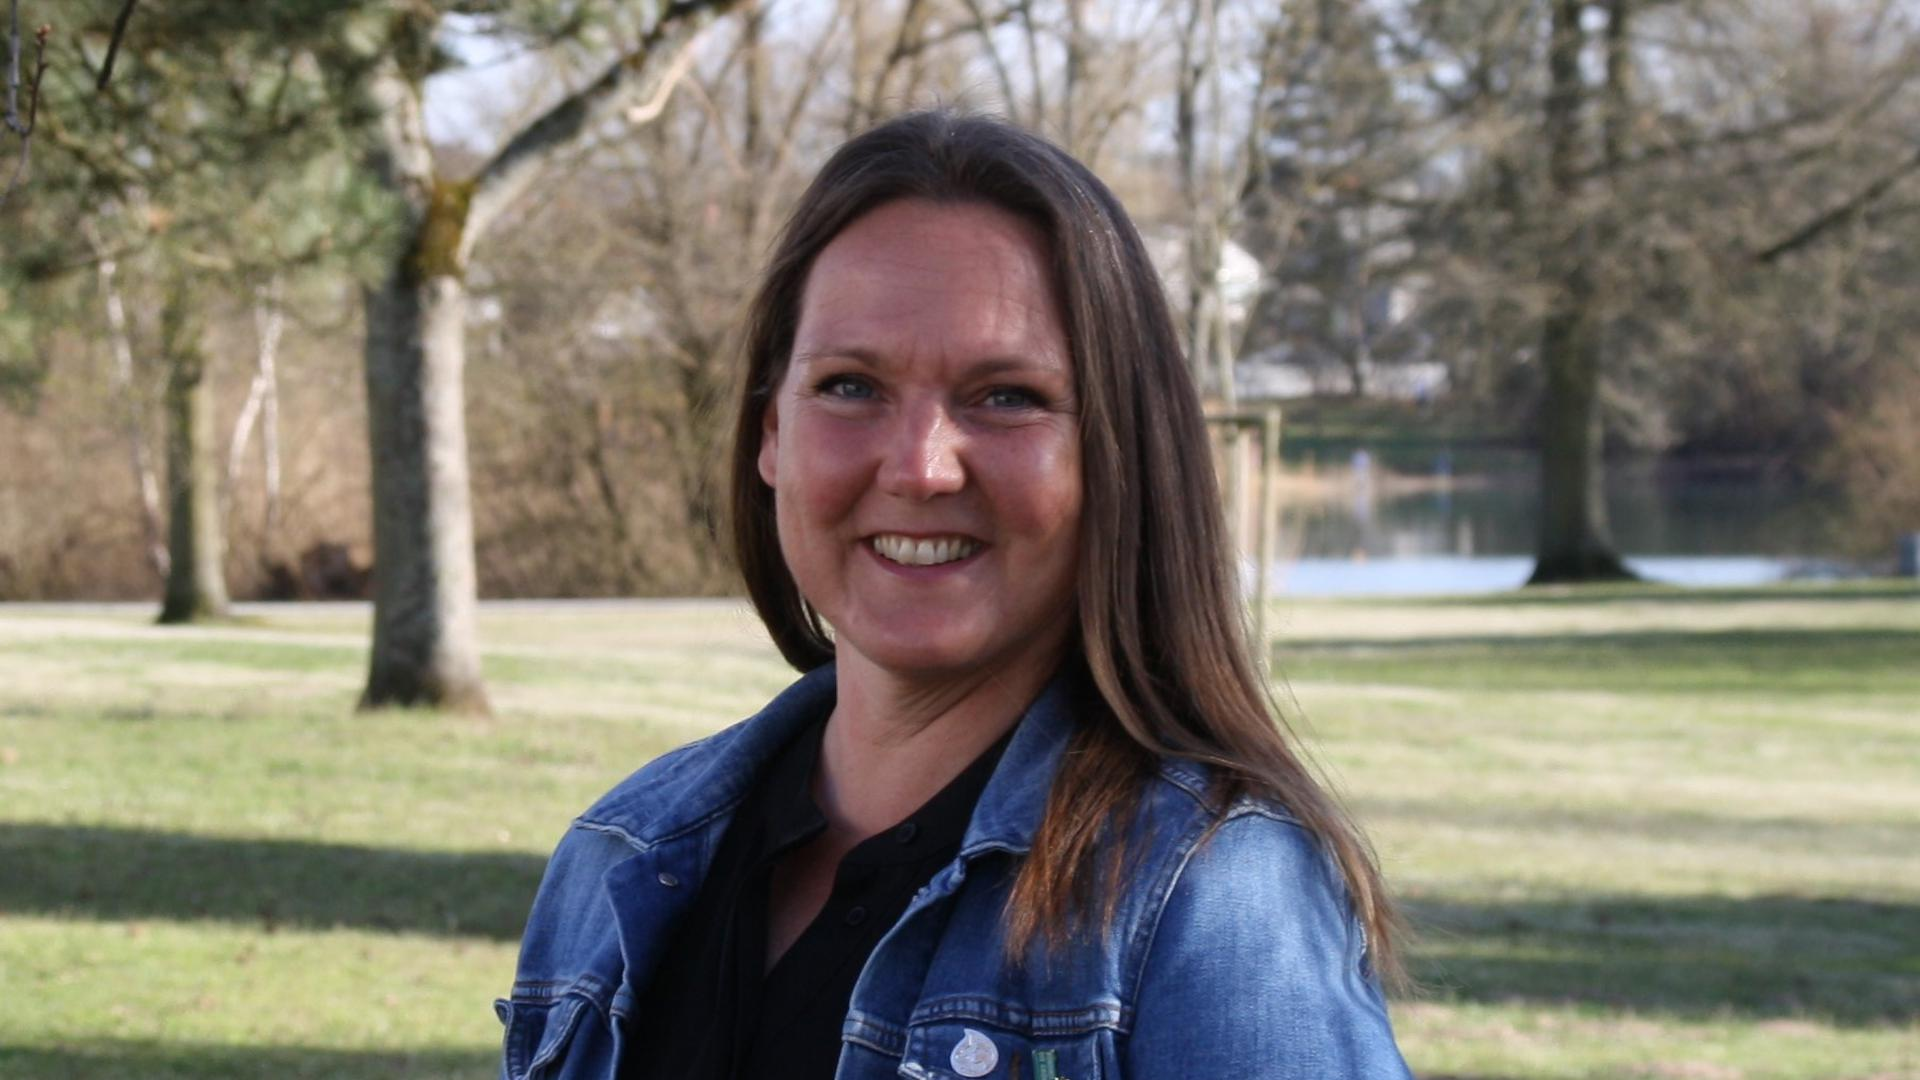 Claudia Greulich